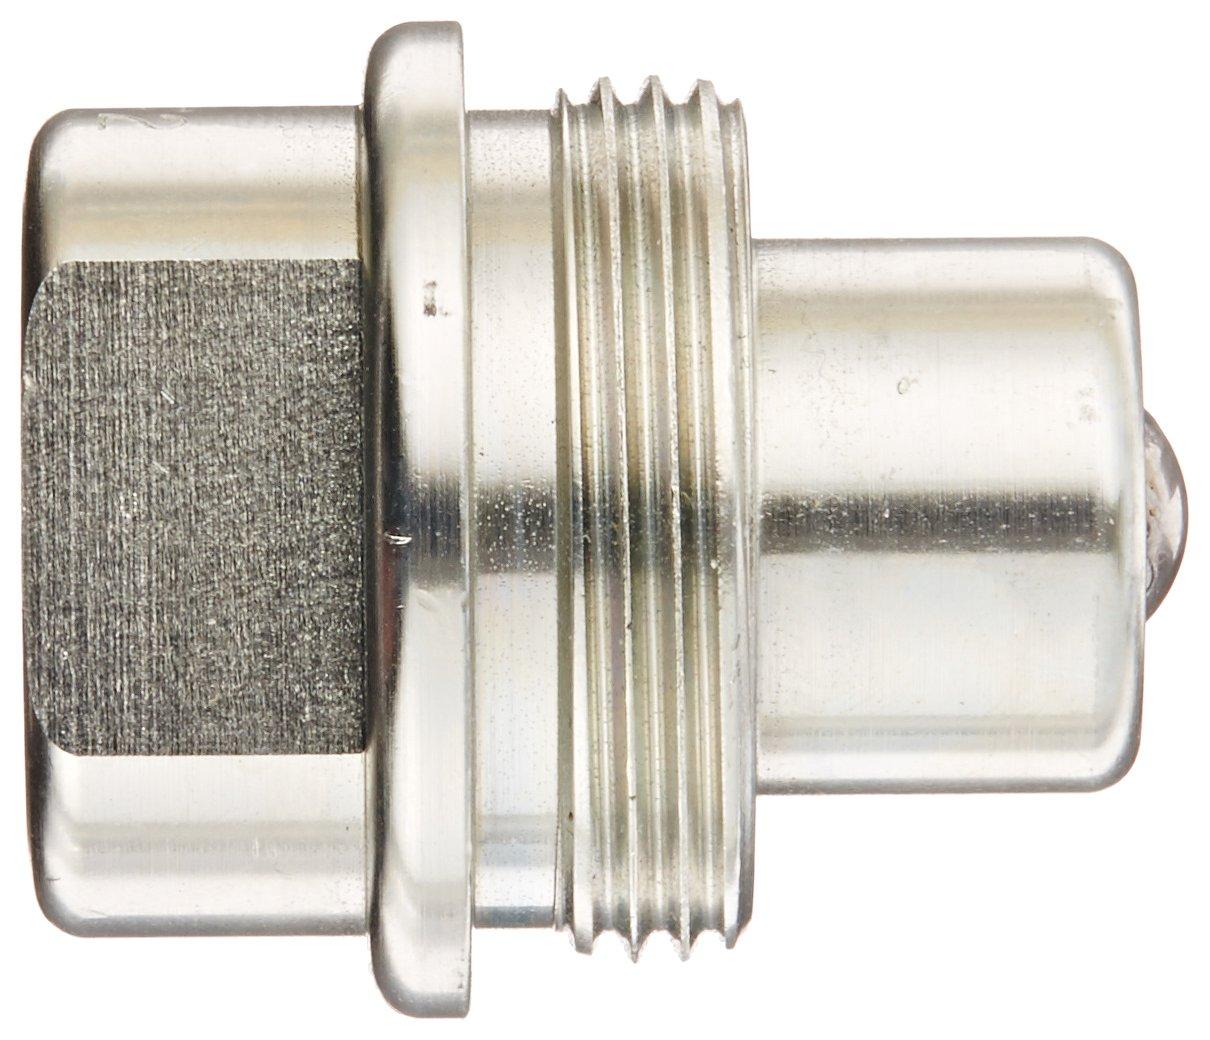 Nipple 1//4 Coupling x 1//4-18 NPTF Female Thread 1//4 Coupling x 1//4-18 NPTF Female Thread Dixon Valve /& Coupling Dixon Valve T2F2 Steel High Pressure Ball Interchange Fitting